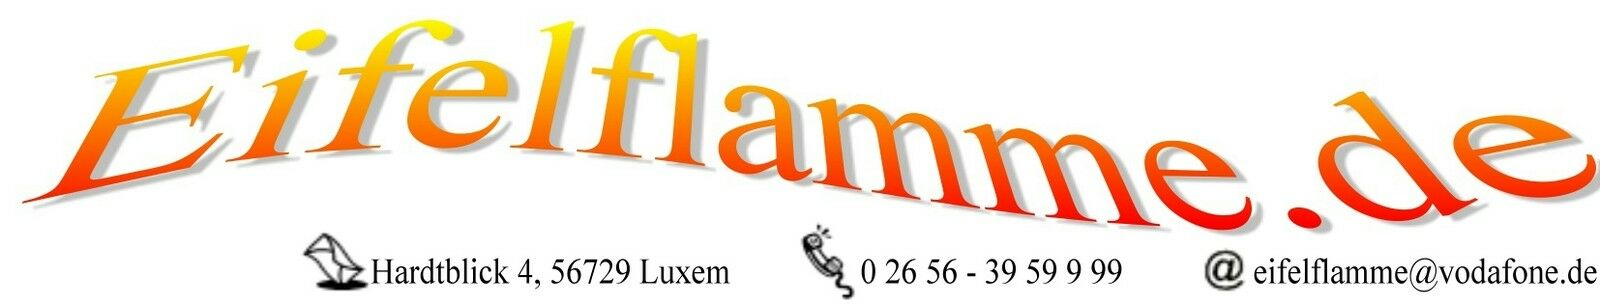 Eifelflamme